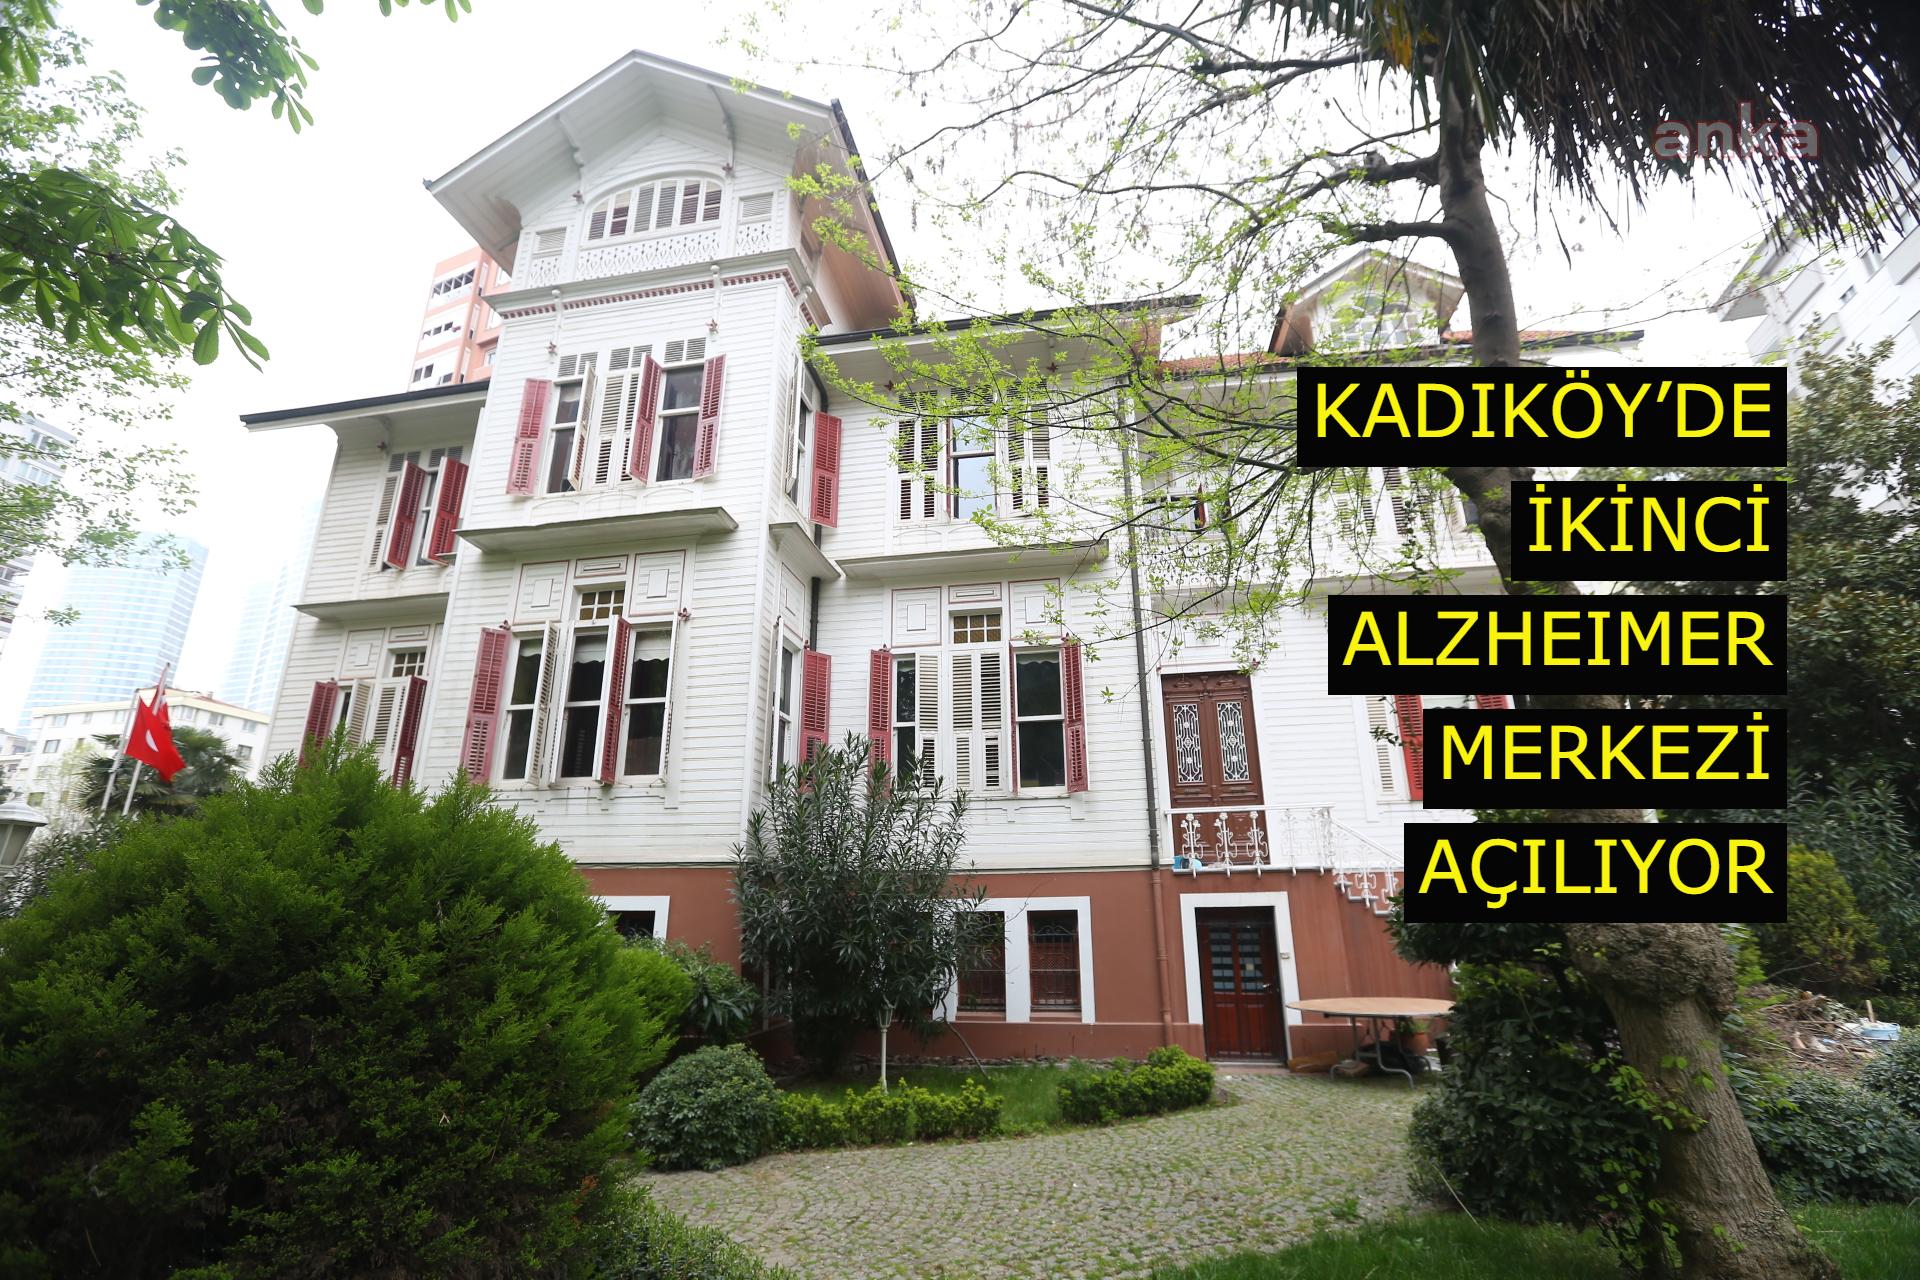 Kadıköy'de ikinci Alzheimer Merkezi açılıyor